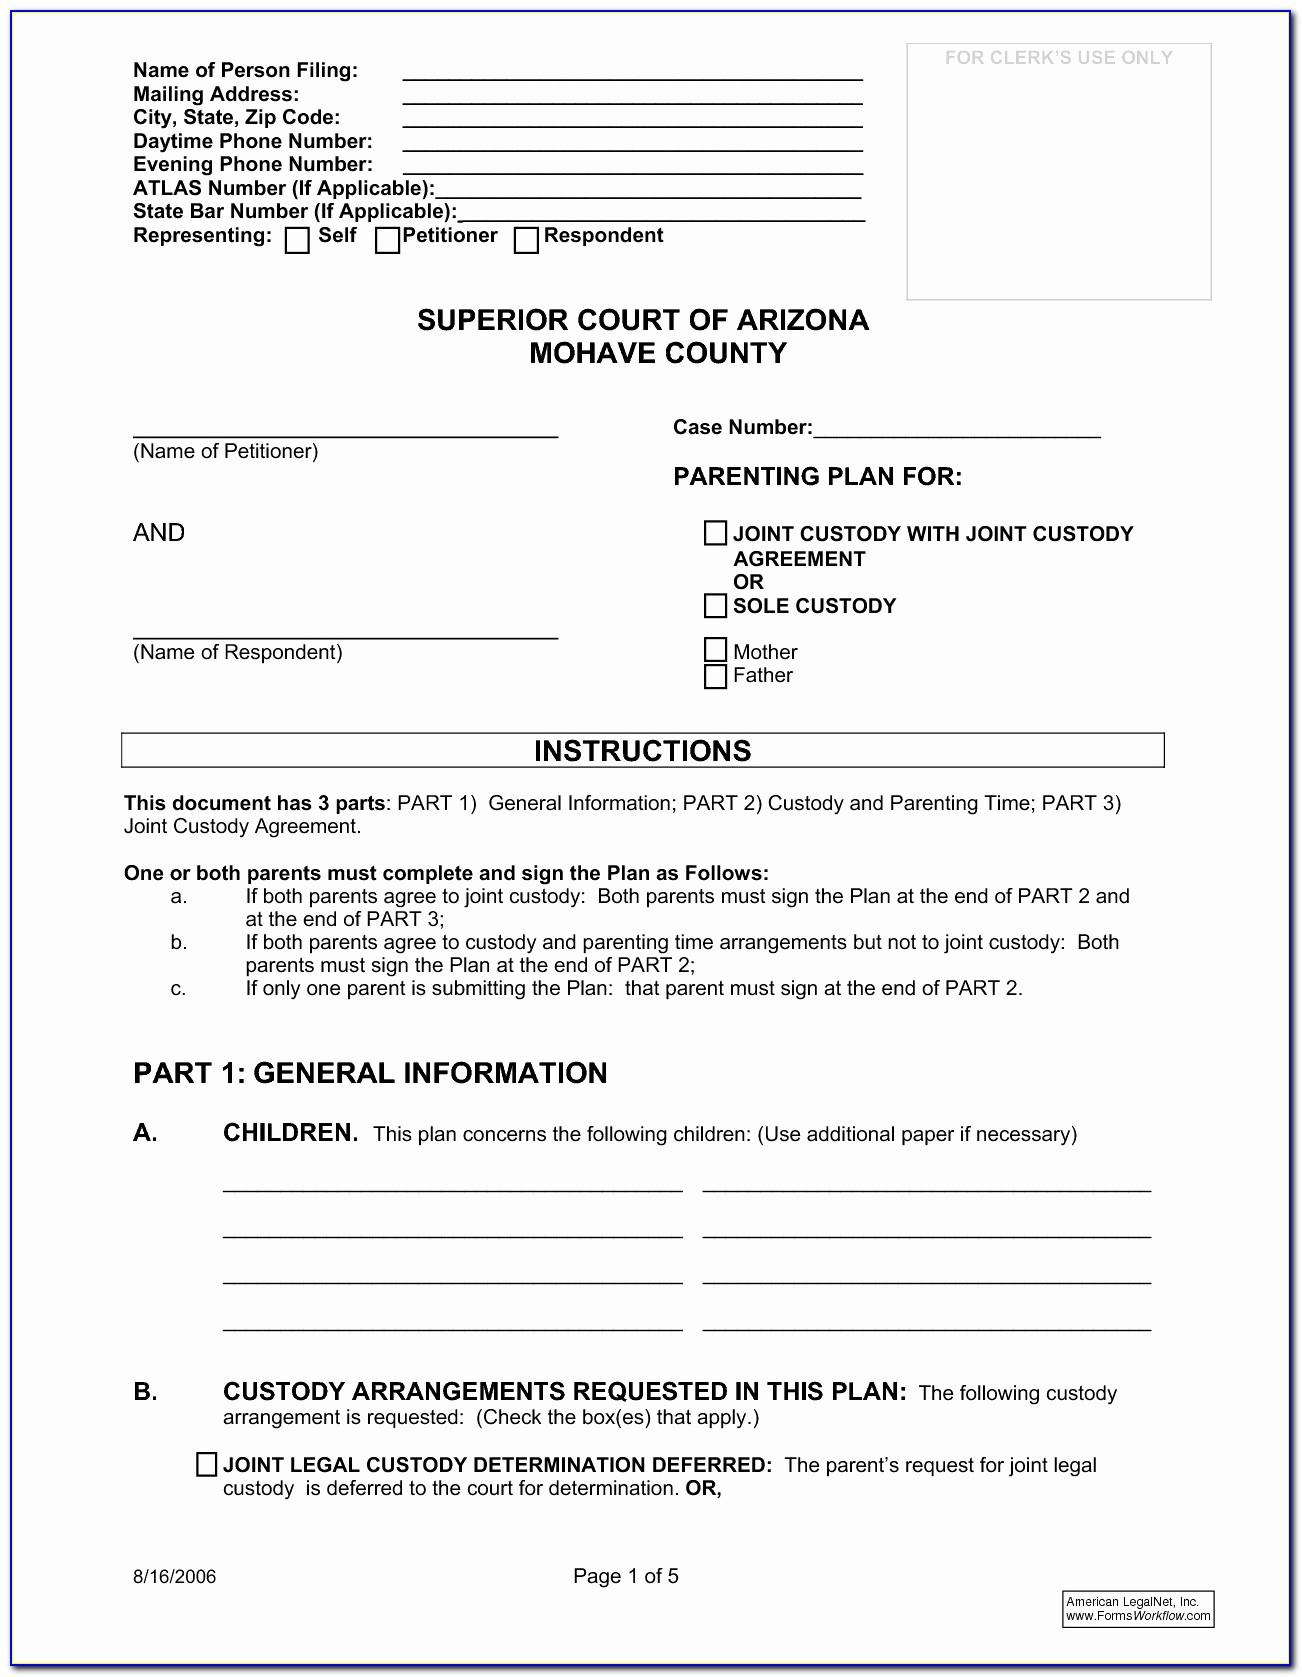 Child Support Agreement Template Elegant Form Joint Custody Agreement Template Child Forms Indiana Inspiring